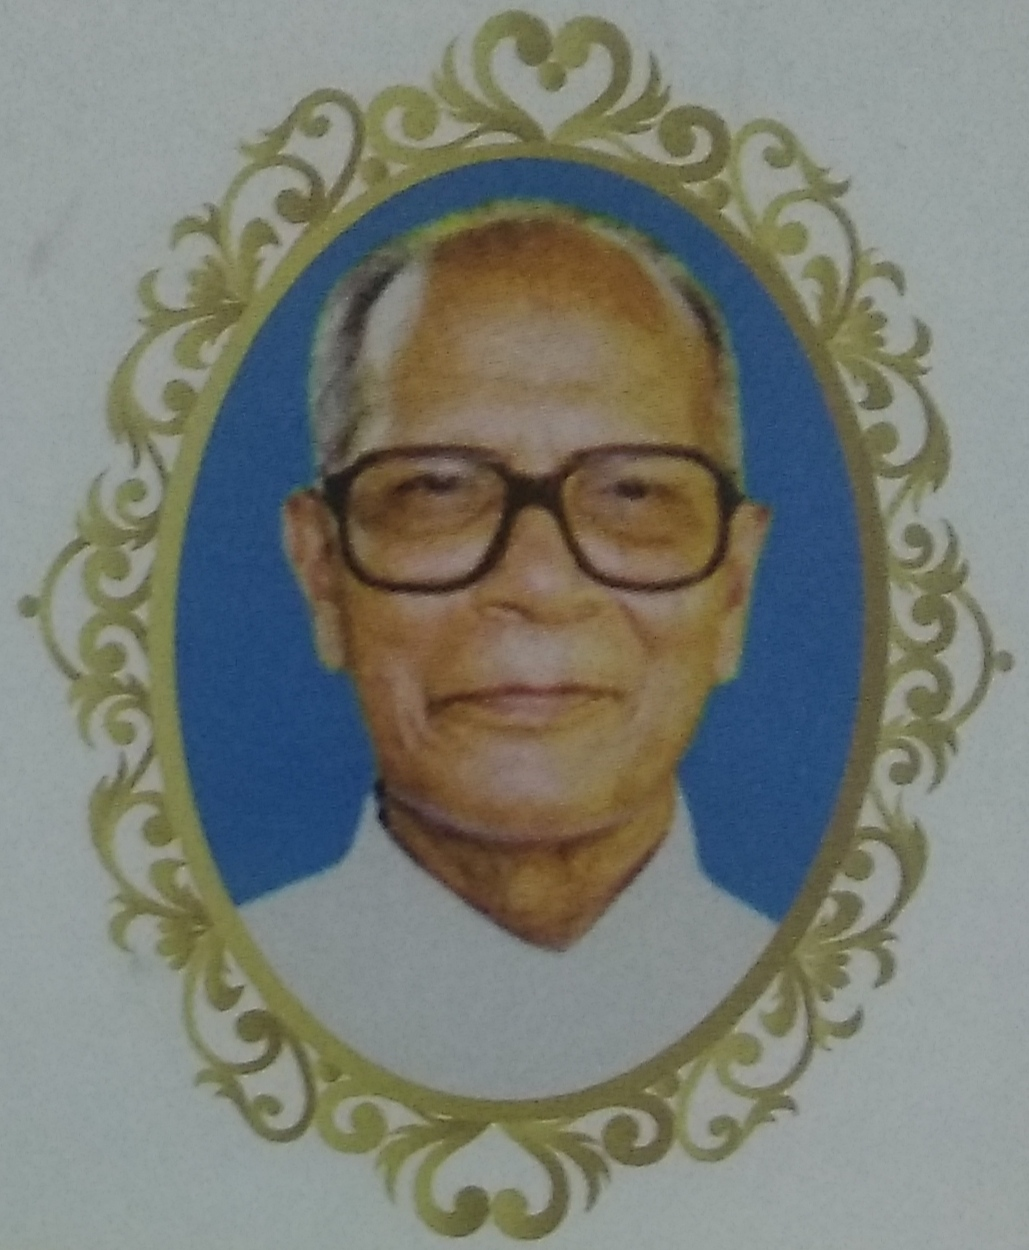 Fr. Alexander Maliekal